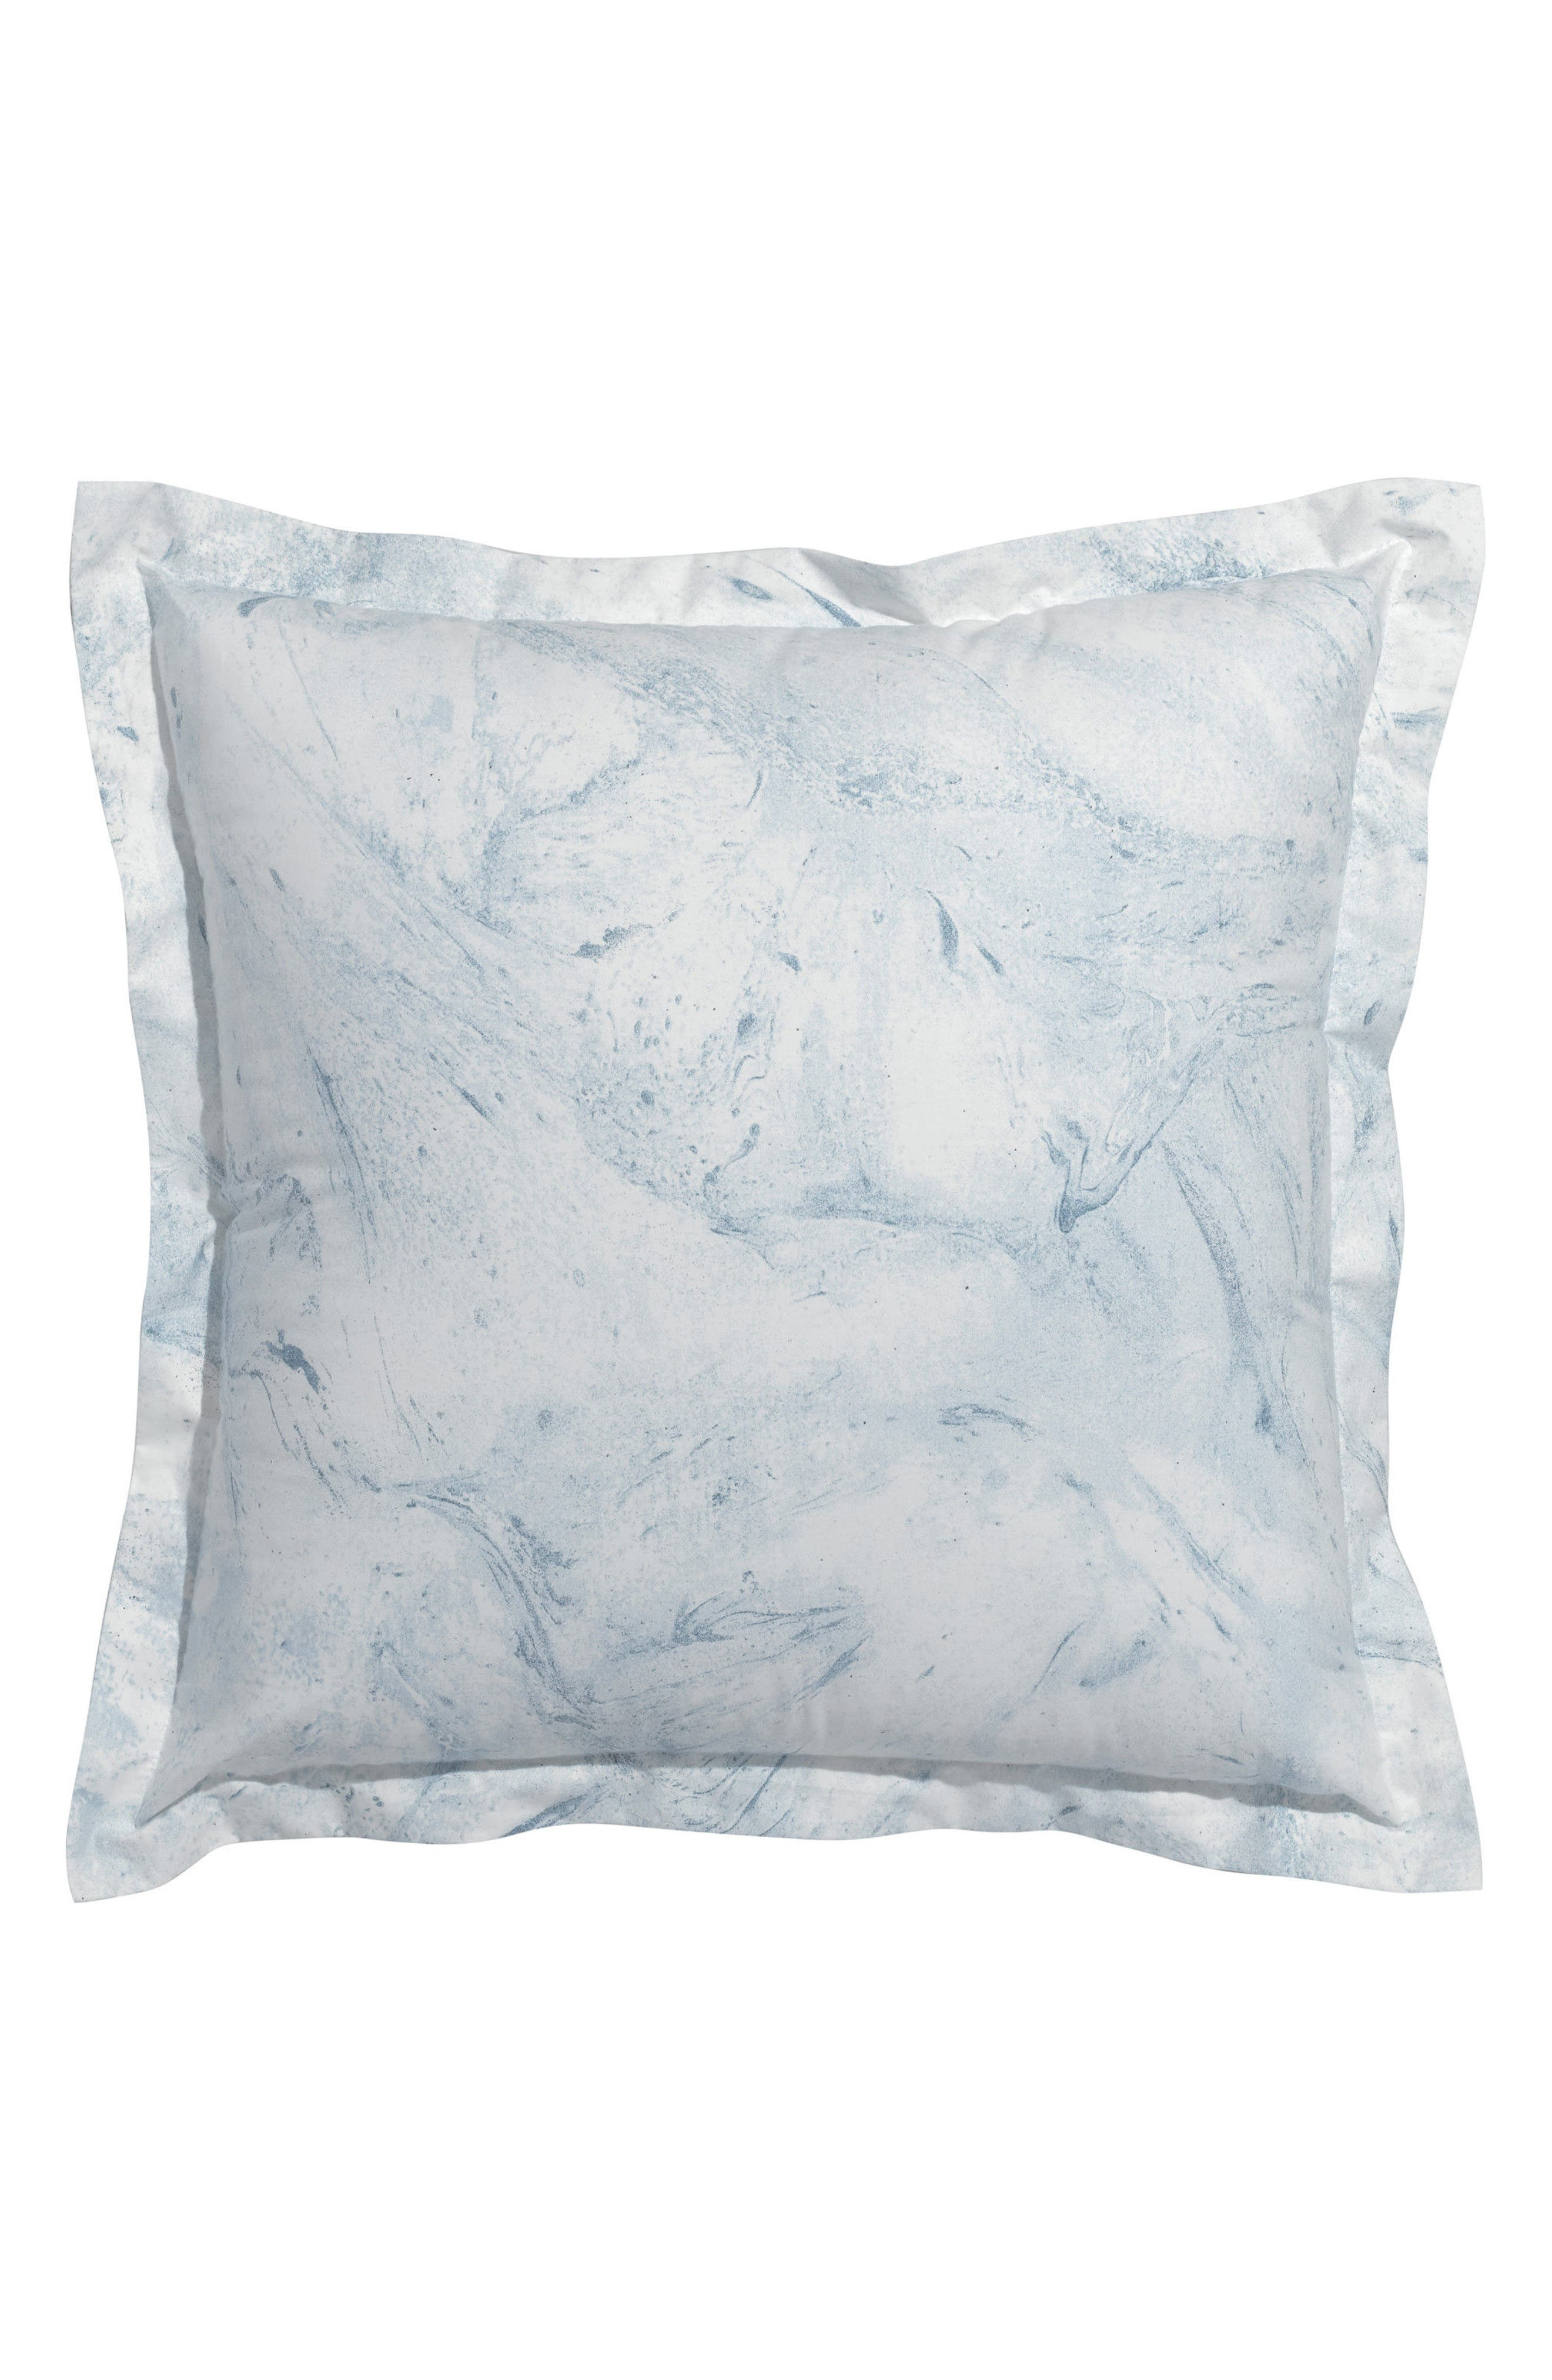 Glacier Bay Square Organic Cotton Accent Pillow,                             Main thumbnail 1, color,